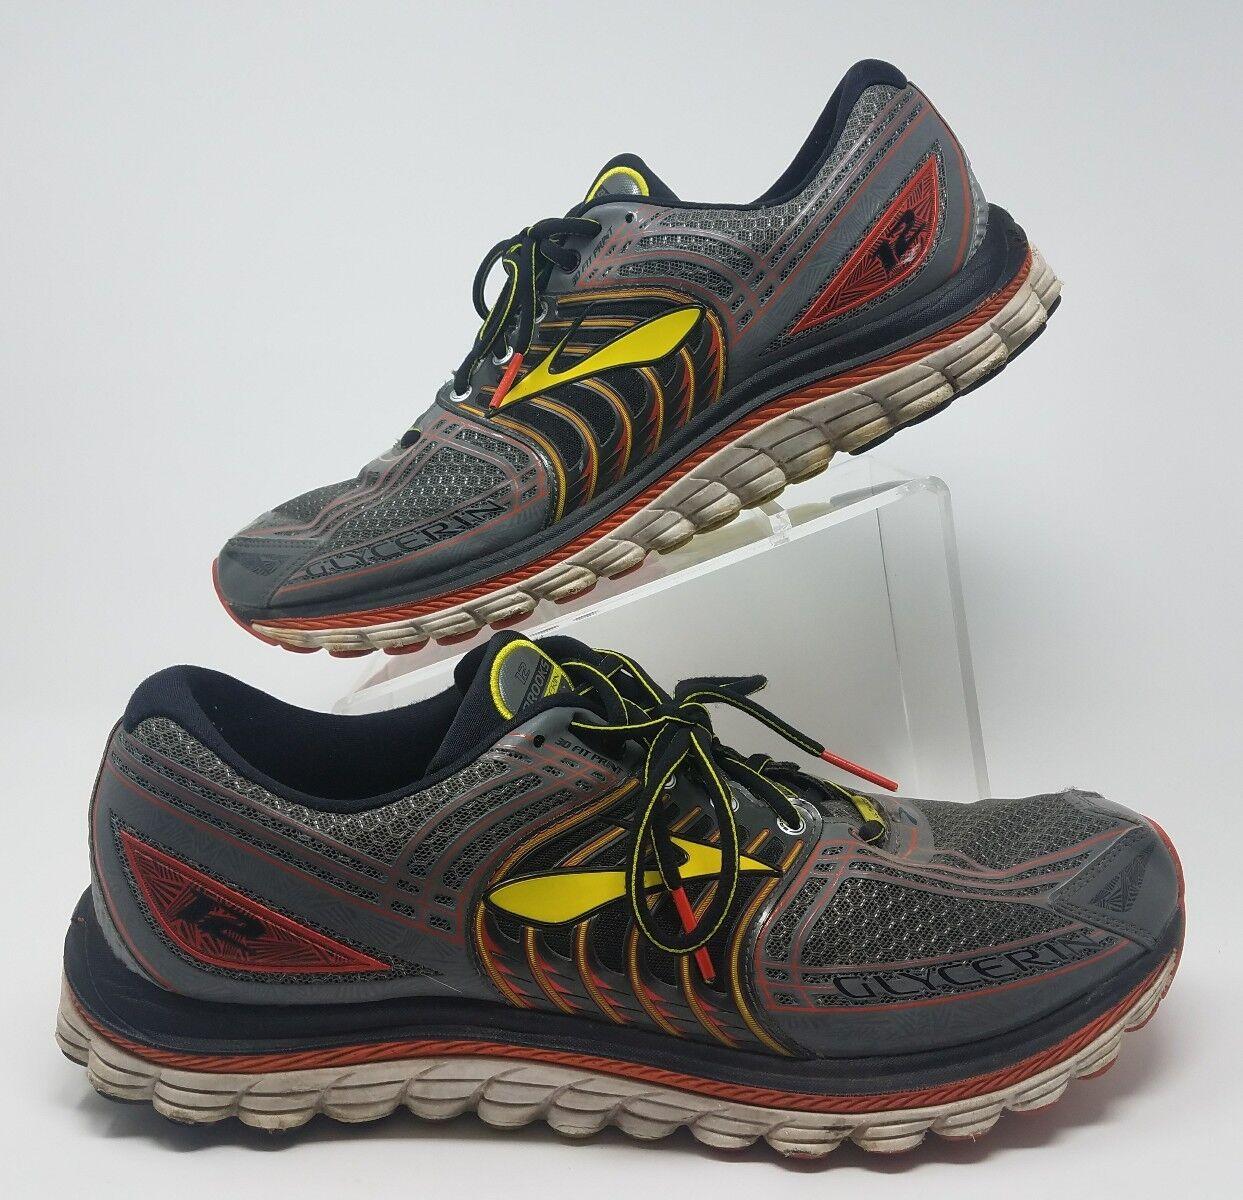 Brooks Glicerina Para hombre 12 Running Zapatos Omni 14 D Omni Zapatos Groove Super ADN Gris Naranja a52866